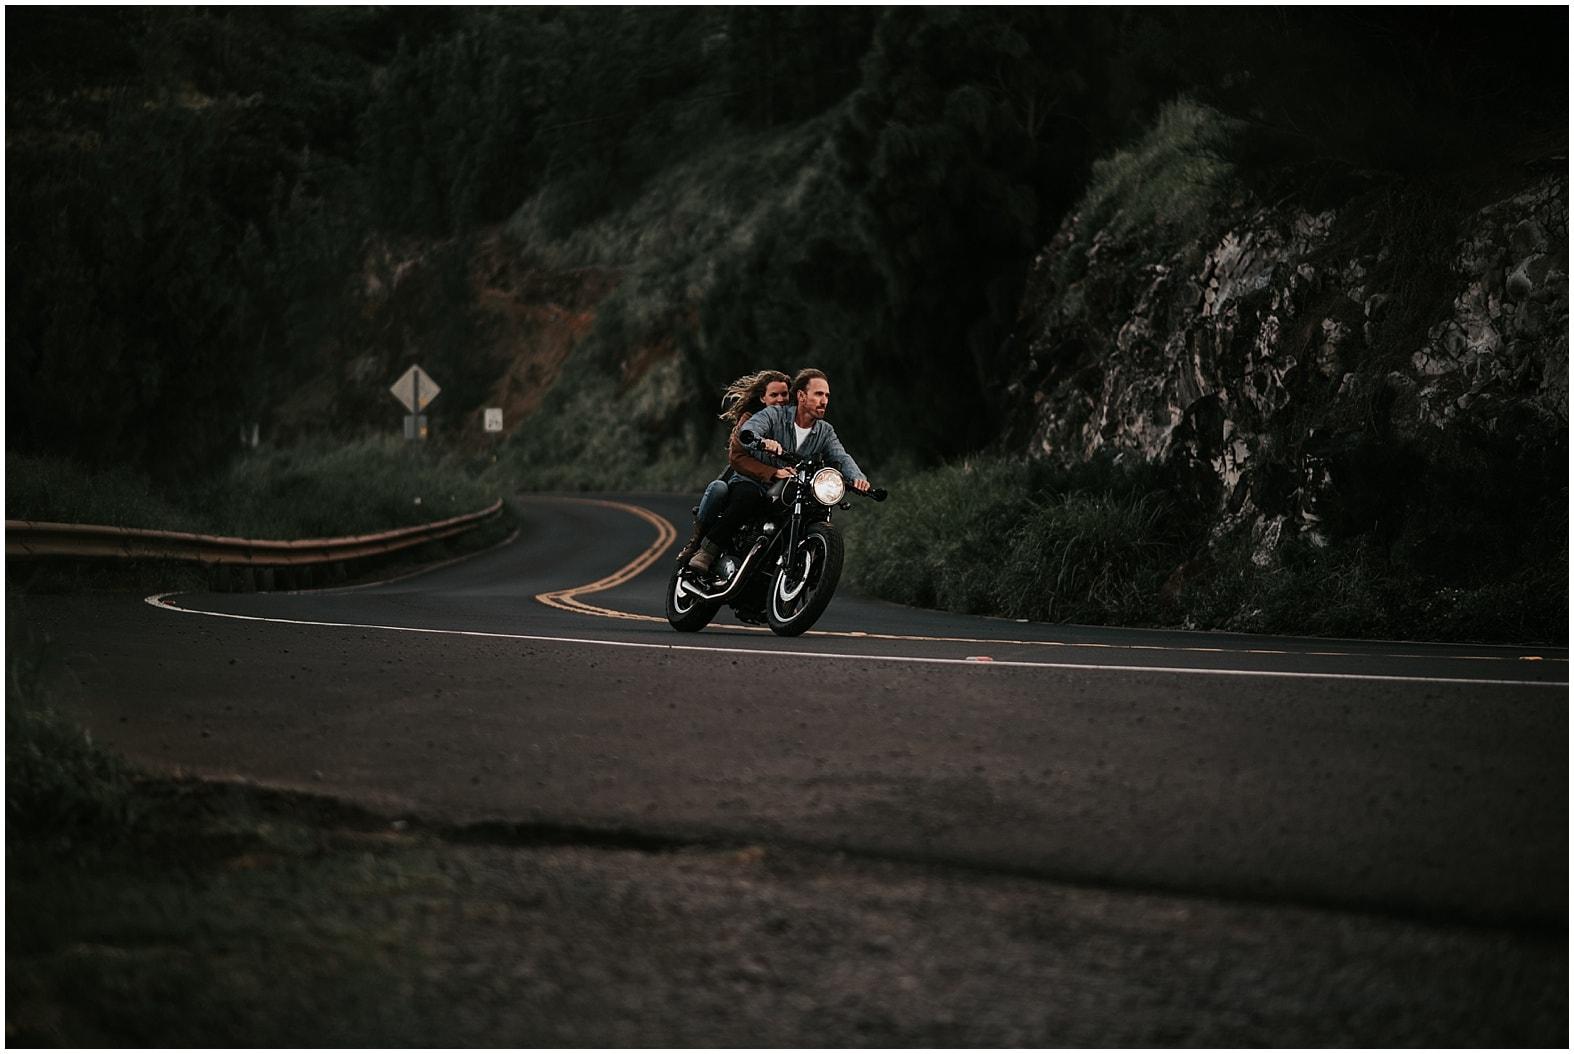 Motorcycle maui2